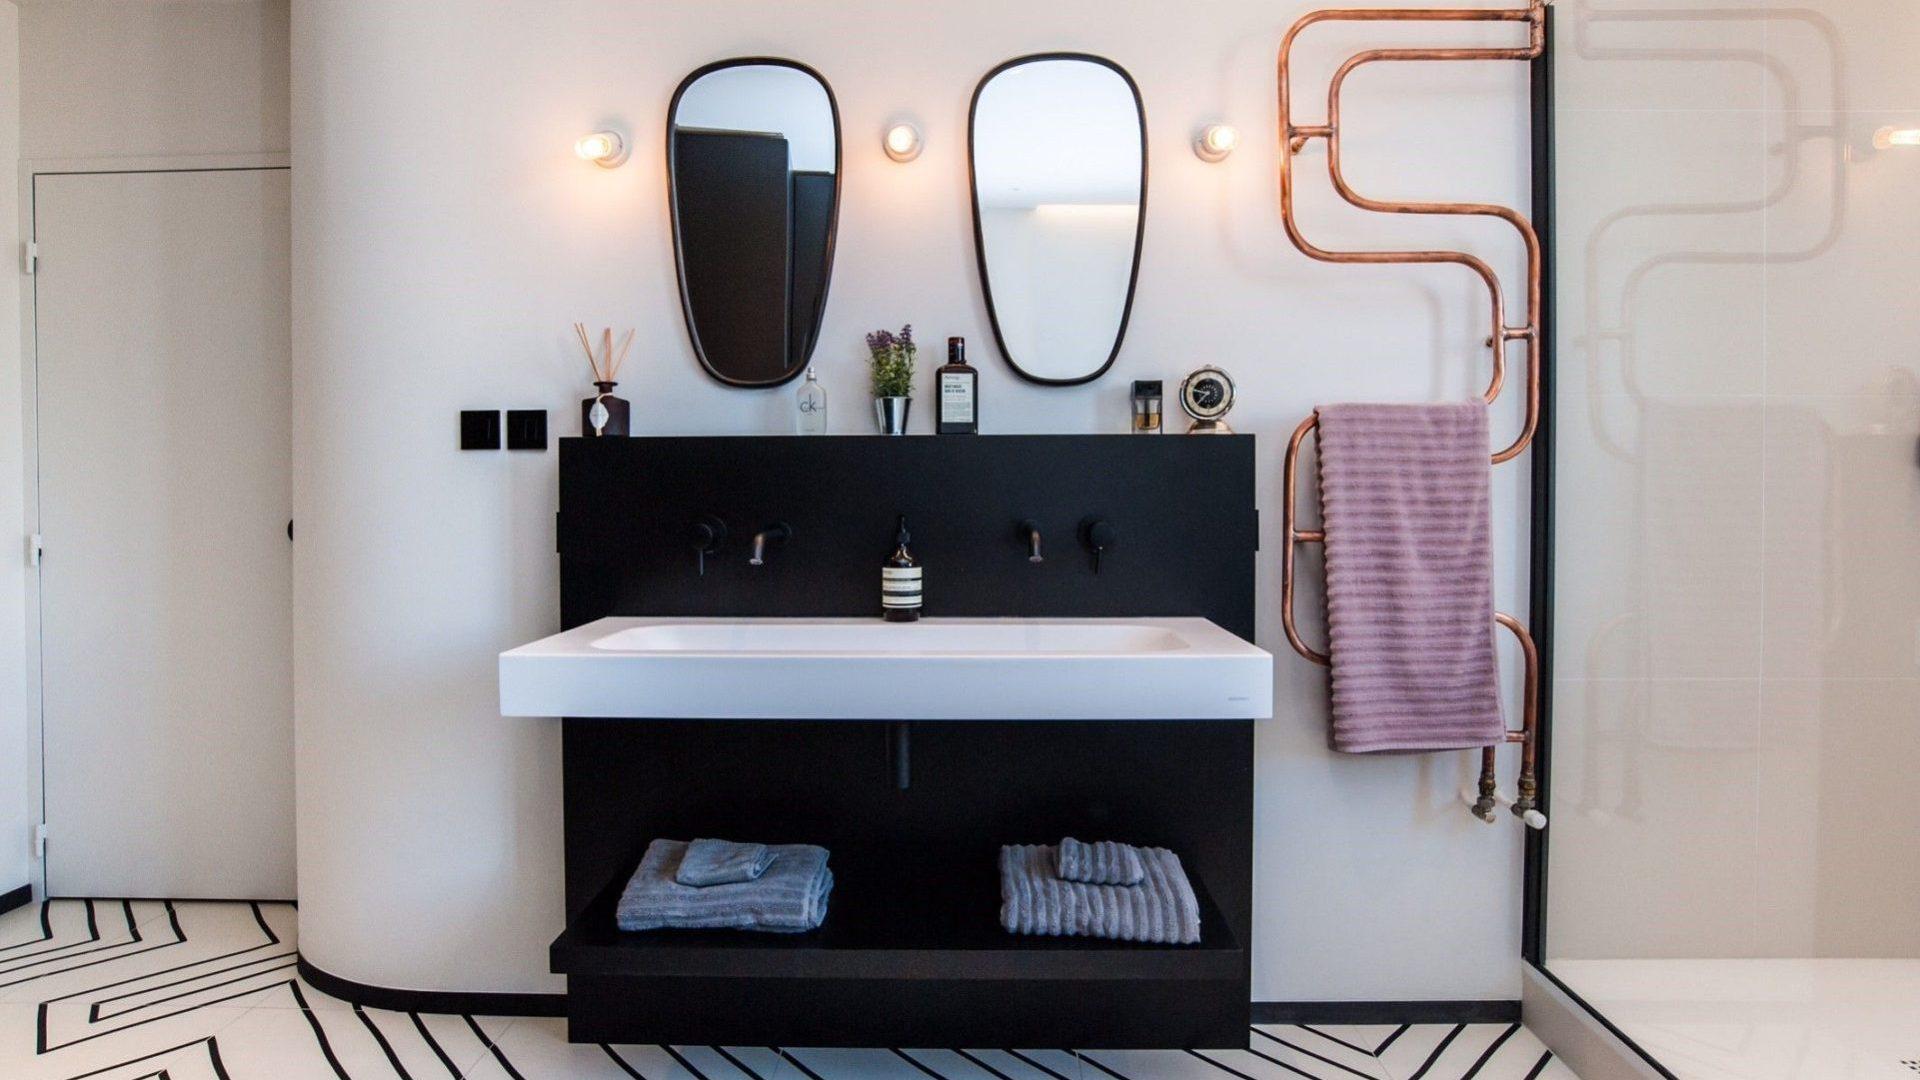 Seuil-architecture-renovation-salle-bain-slid-2-e1525331325613